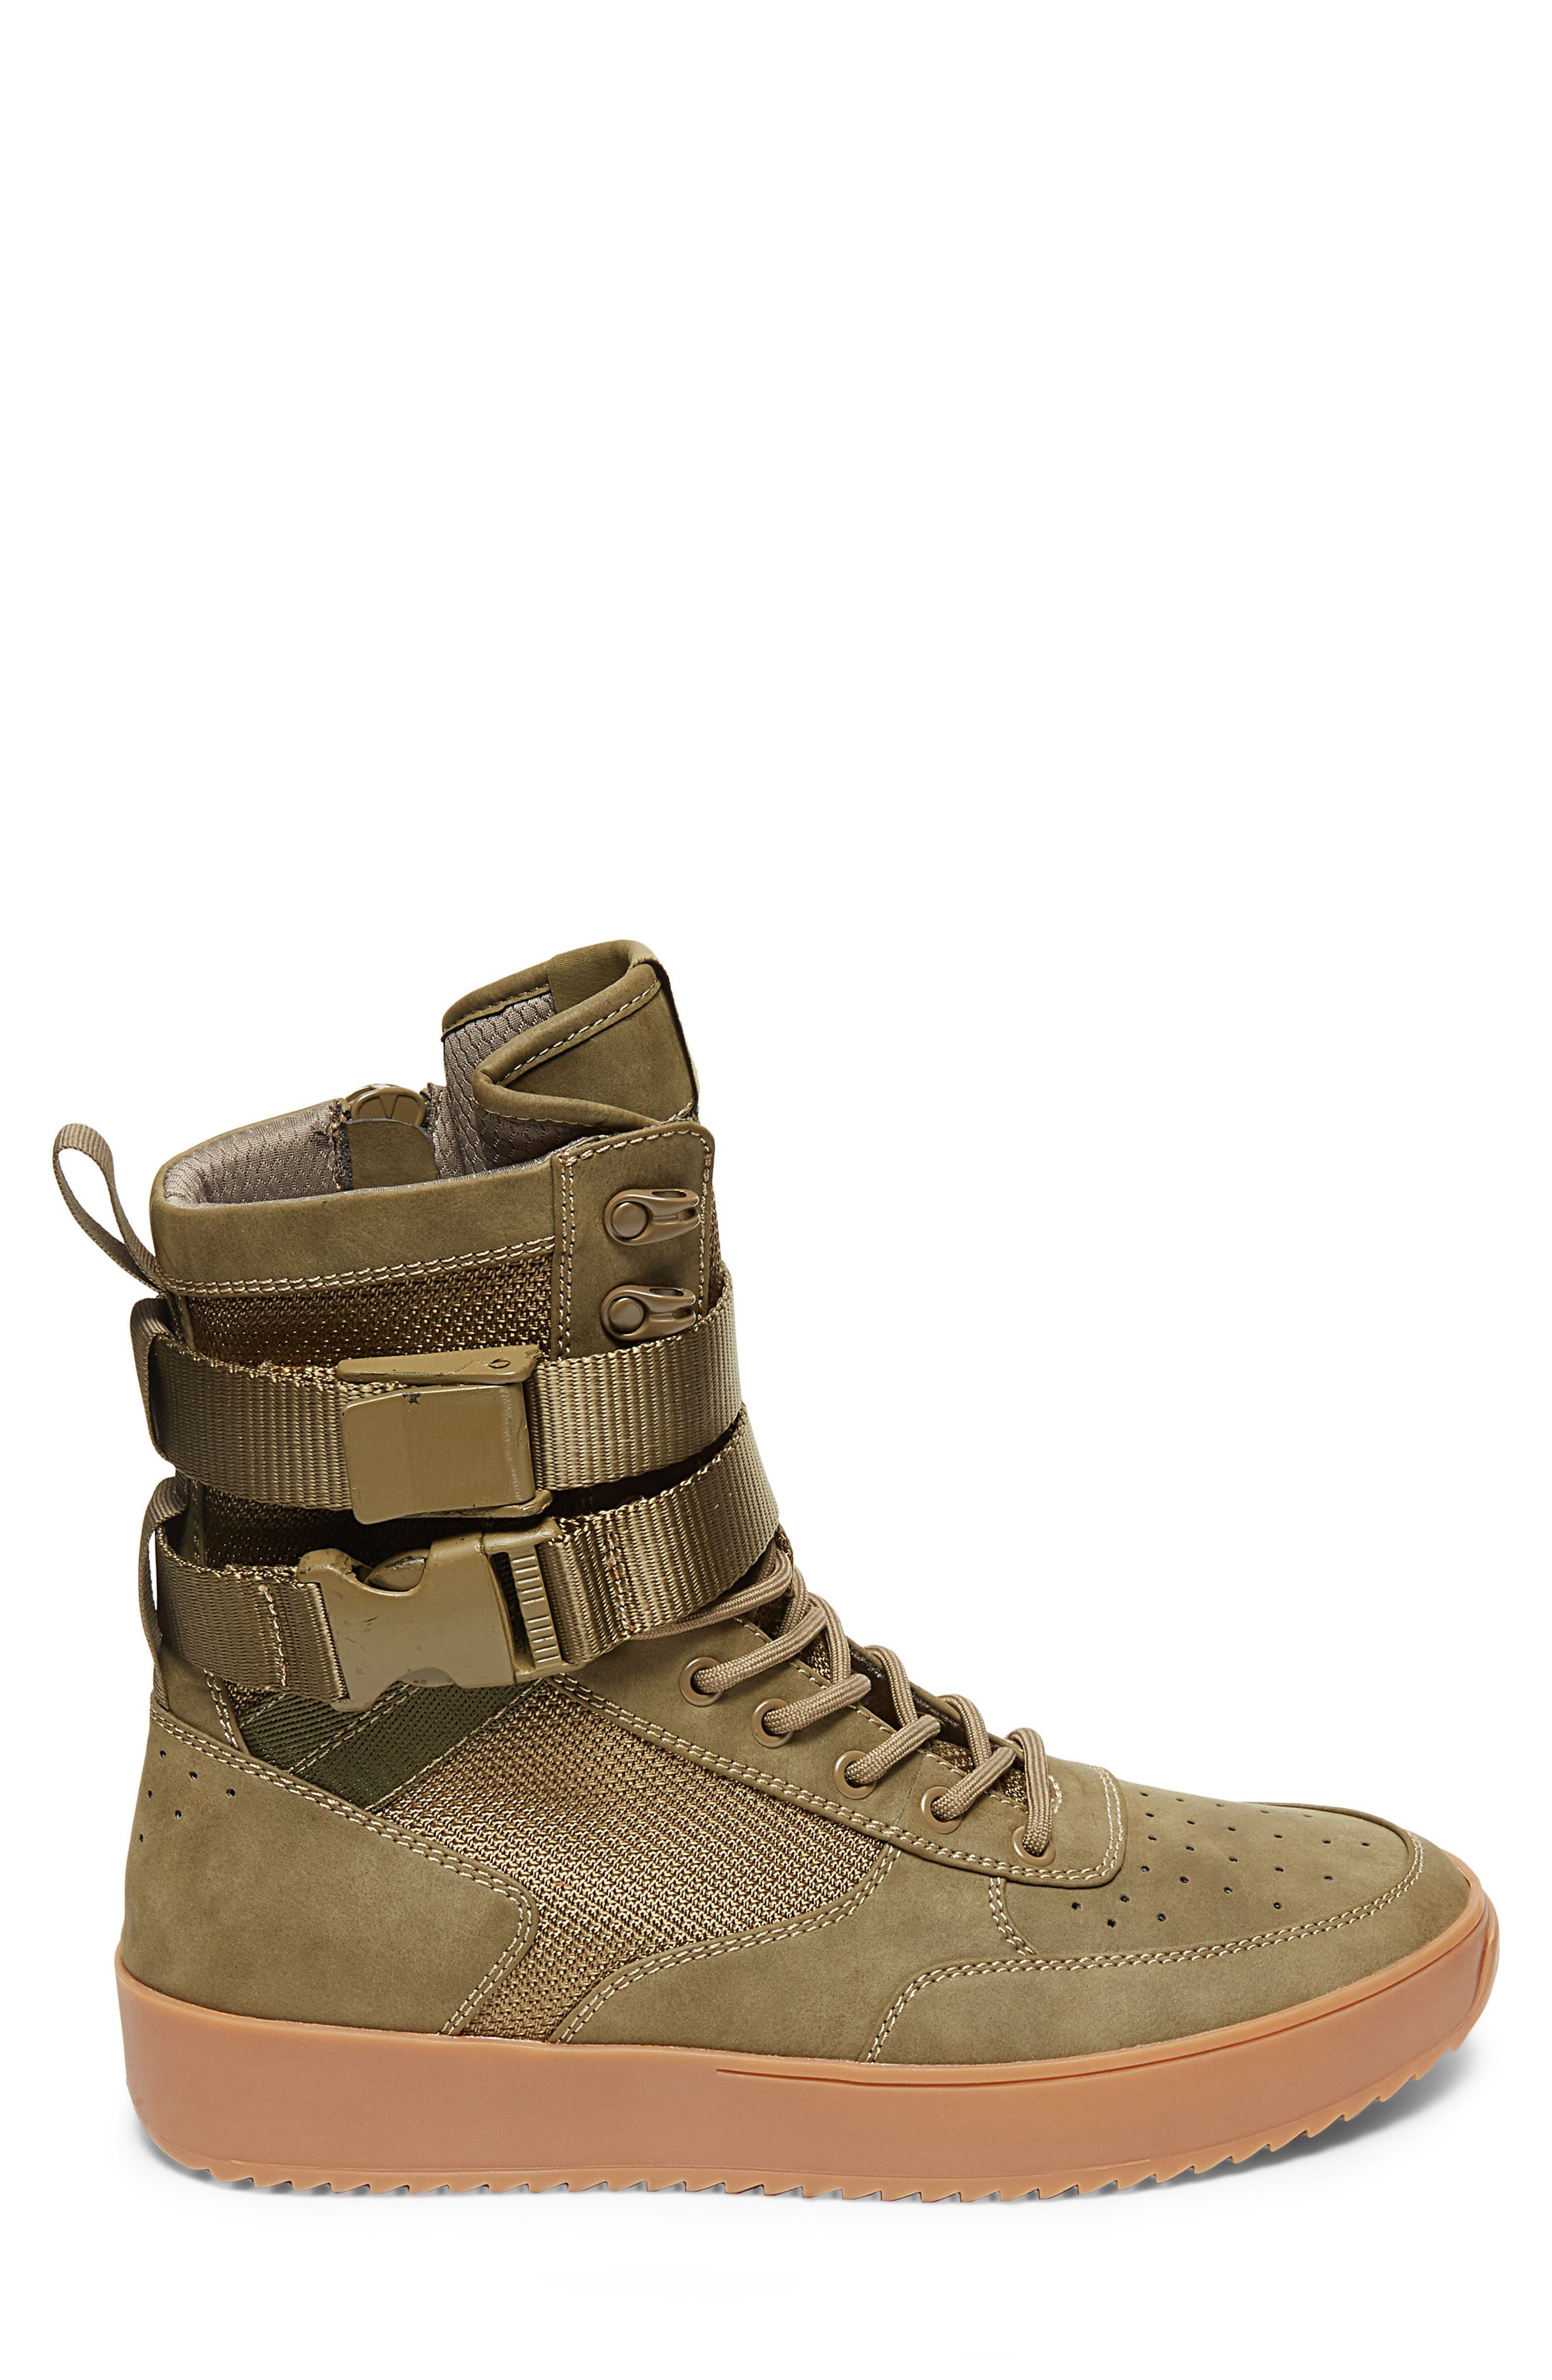 Zeroday Sneaker,                             Alternate thumbnail 9, color,